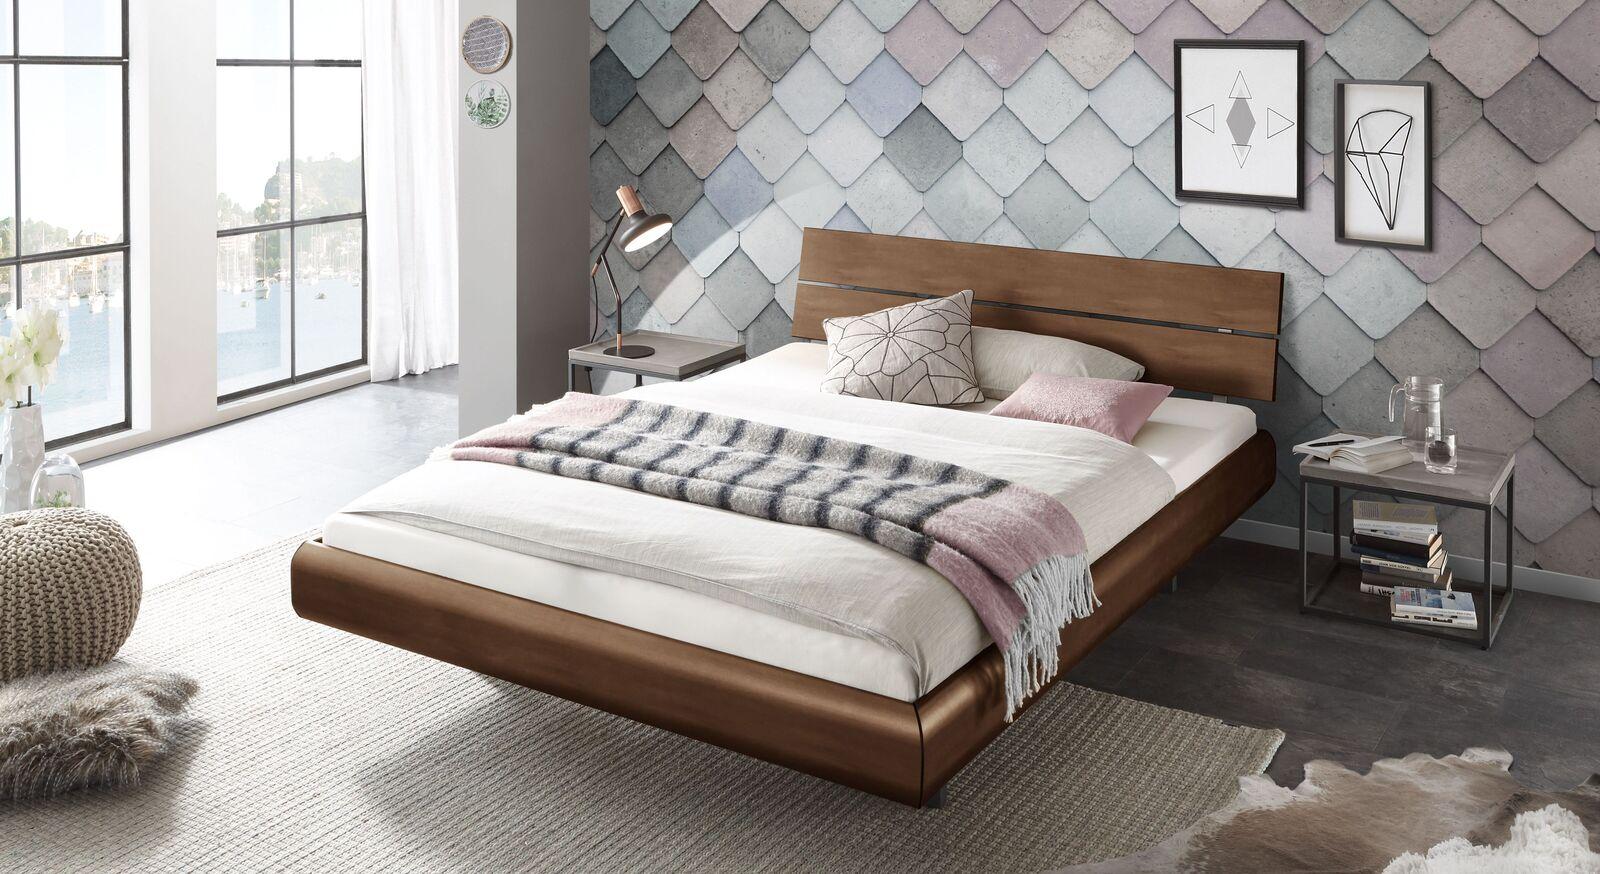 Passende Produkte zum Bett Galatis